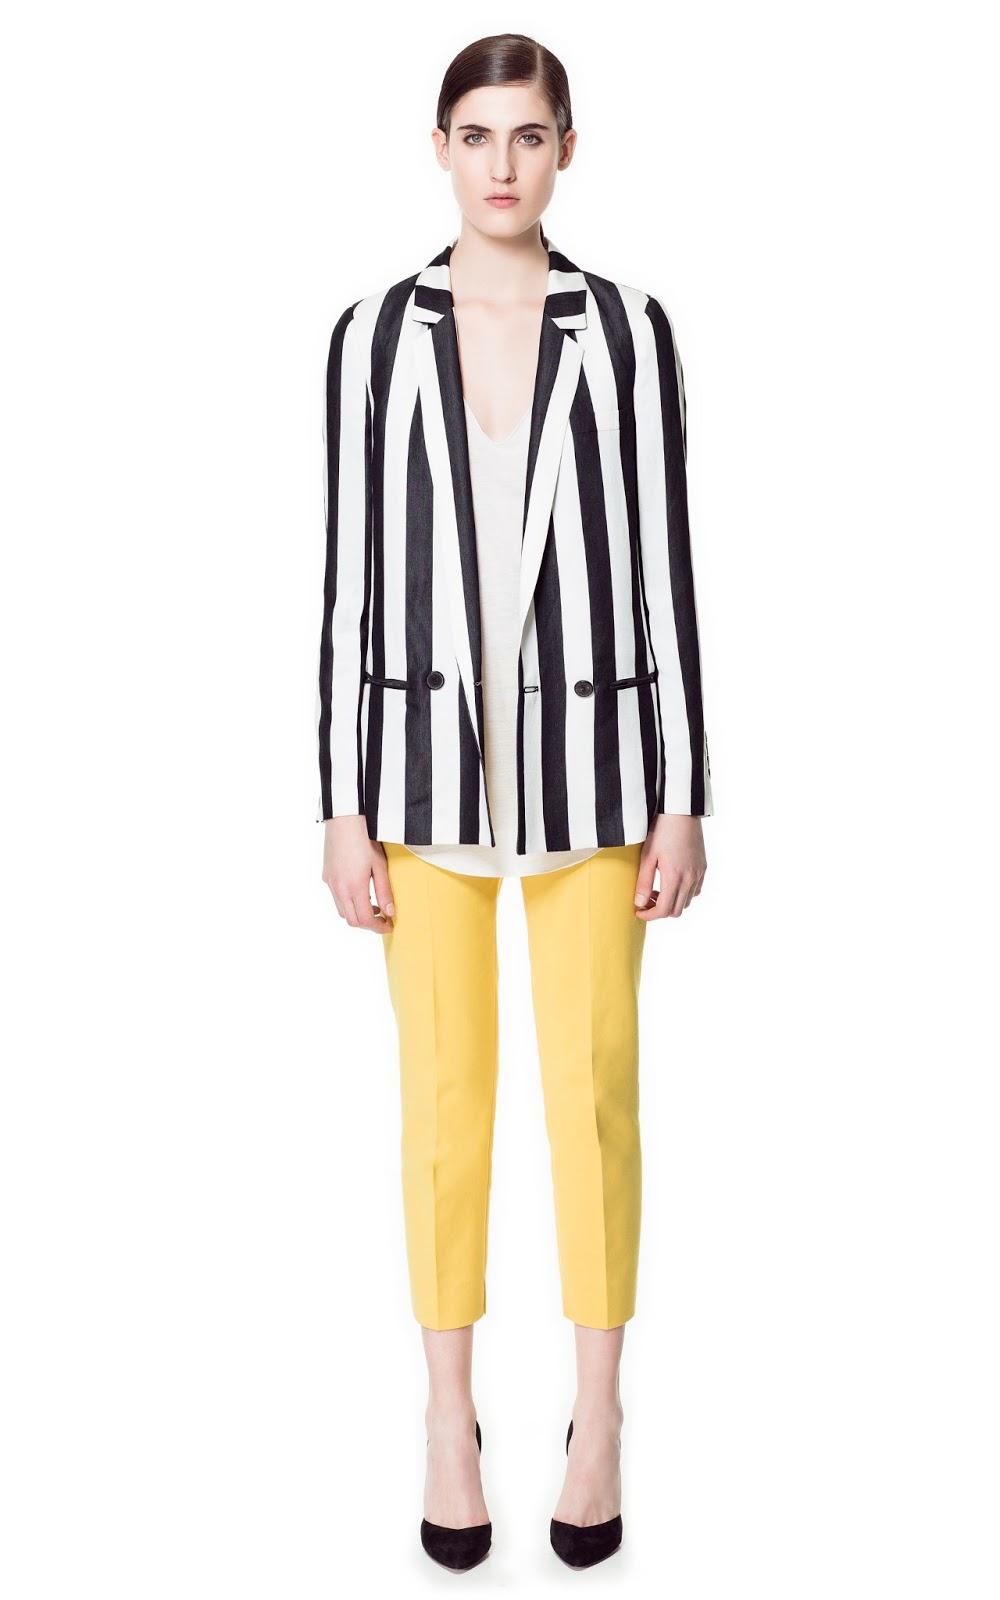 607d02b3f Rayas blancas y negras : Pinceladas de estilo - Blog de moda ...